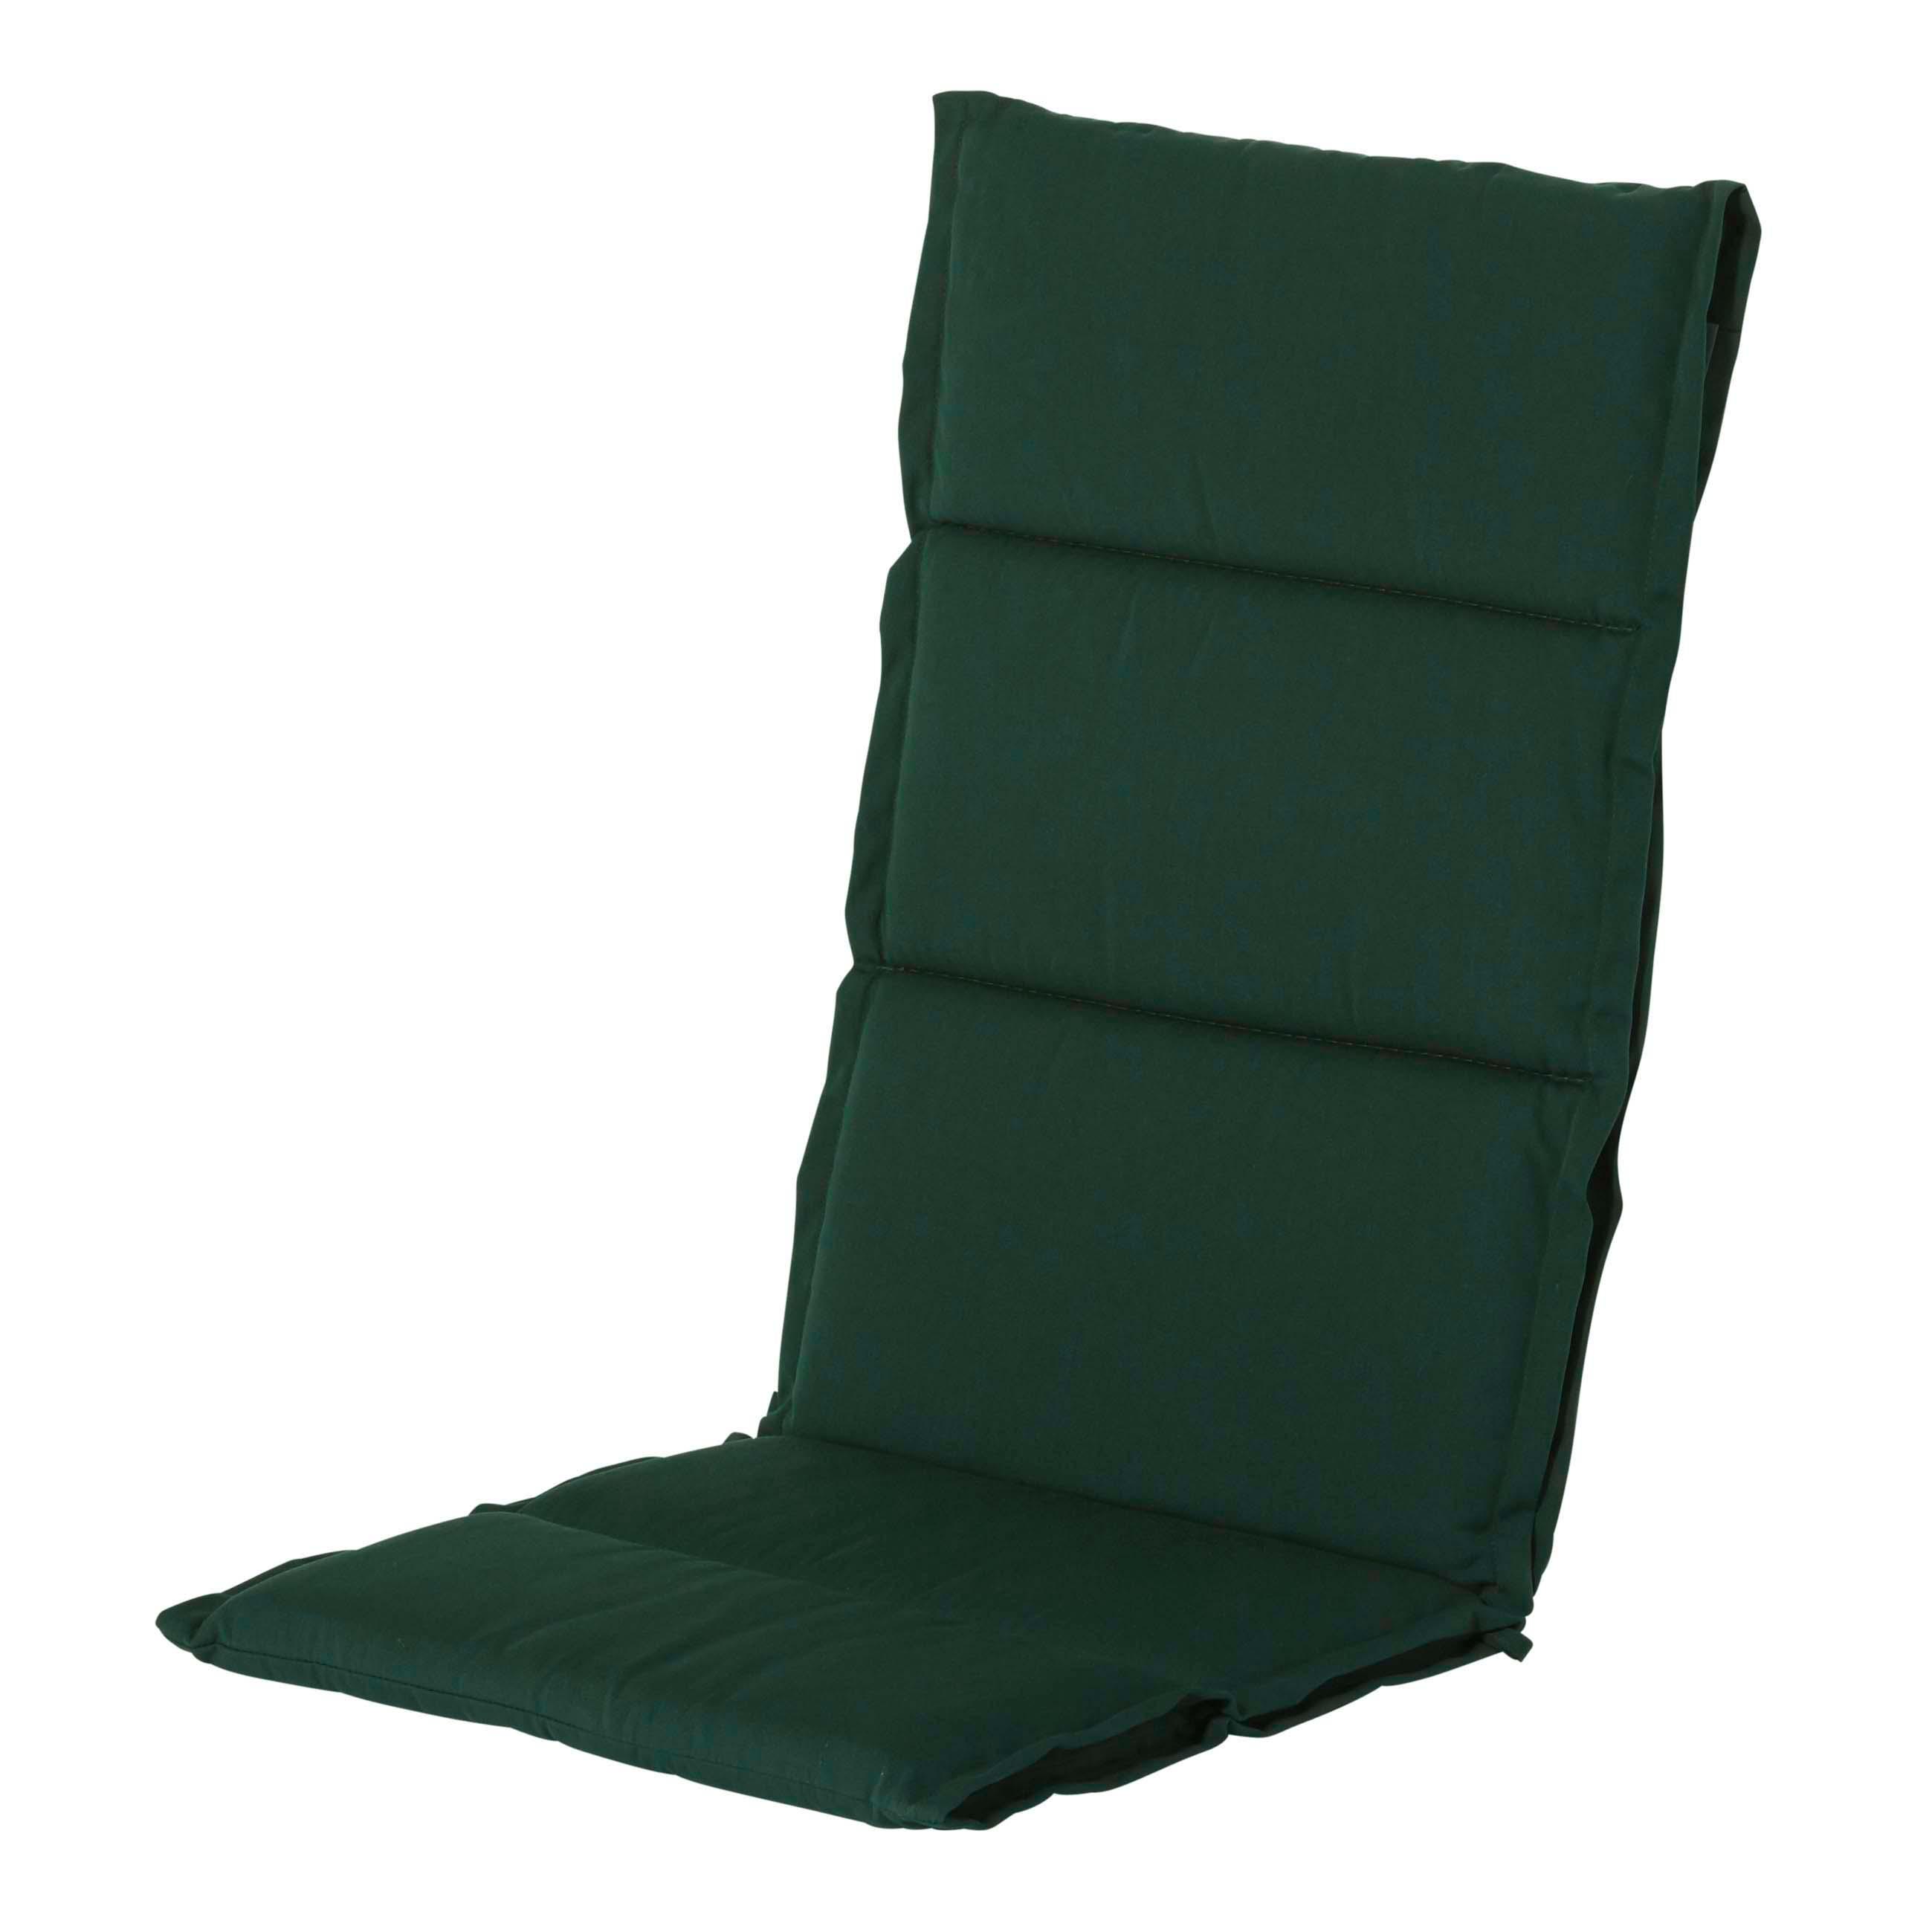 Auflage Hochlehner Dünn - Havana Grün